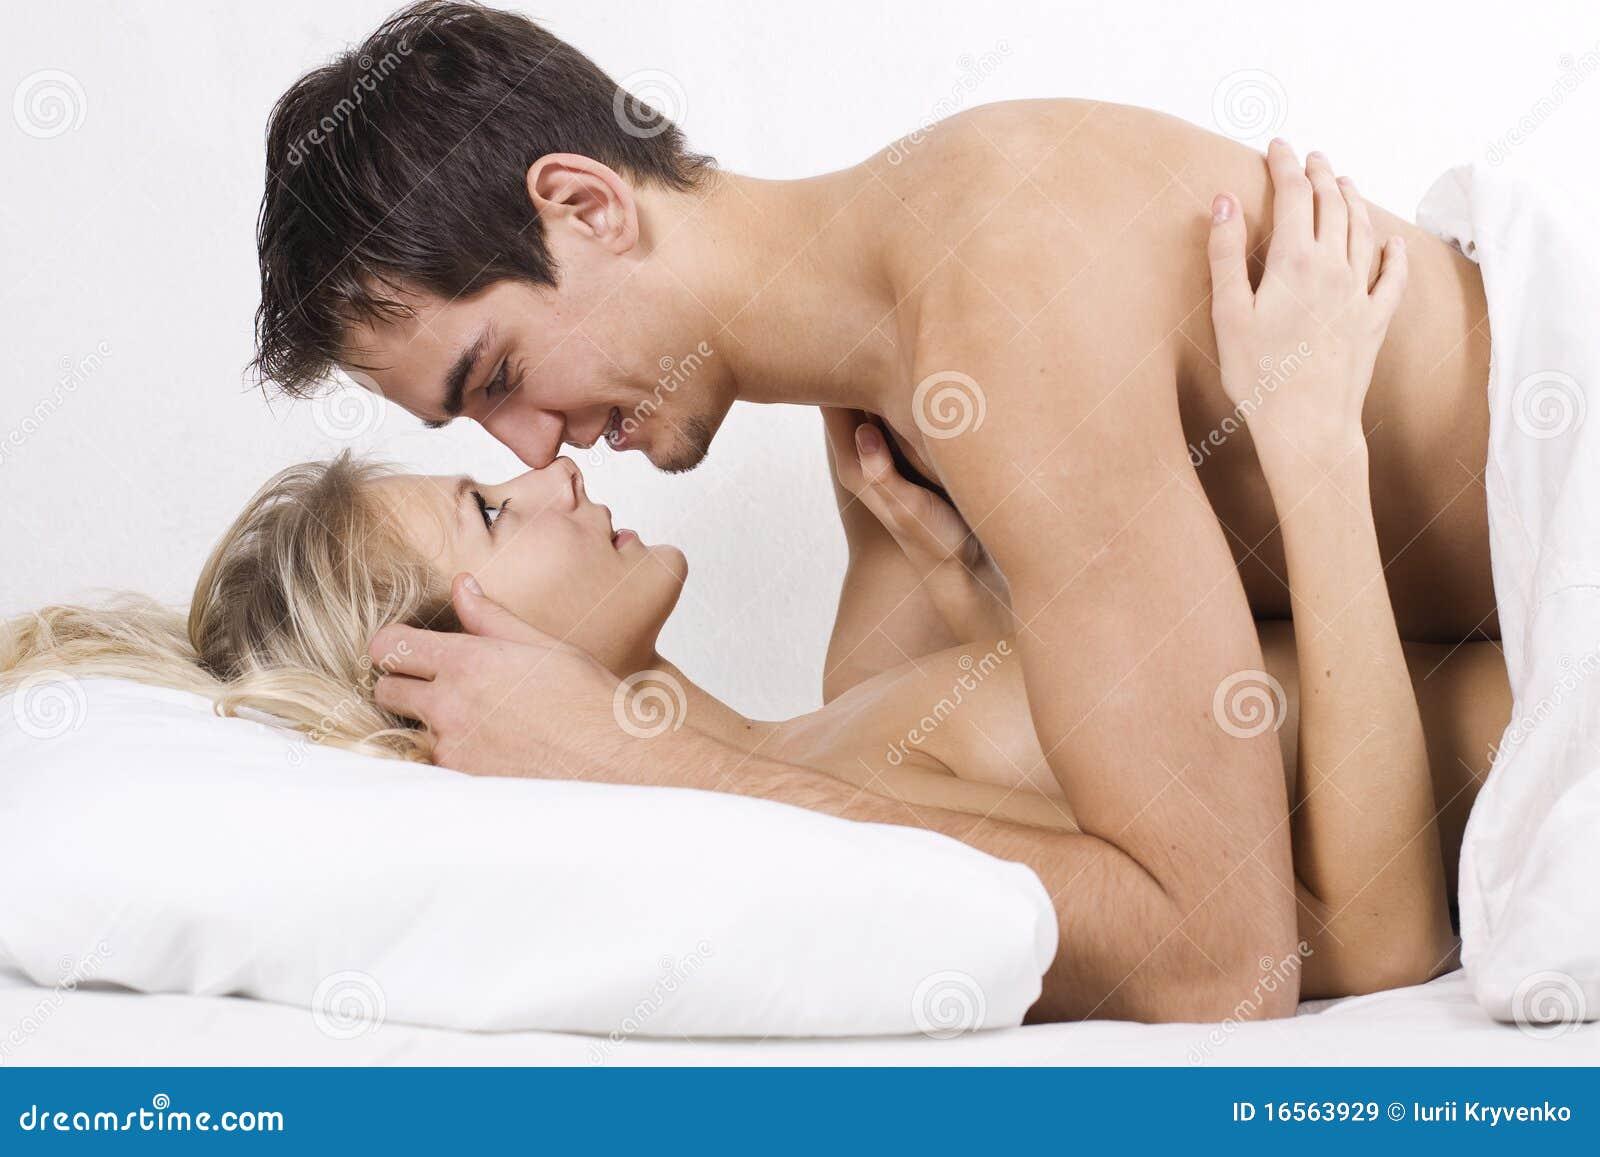 секс мужчина женщина позы картинки